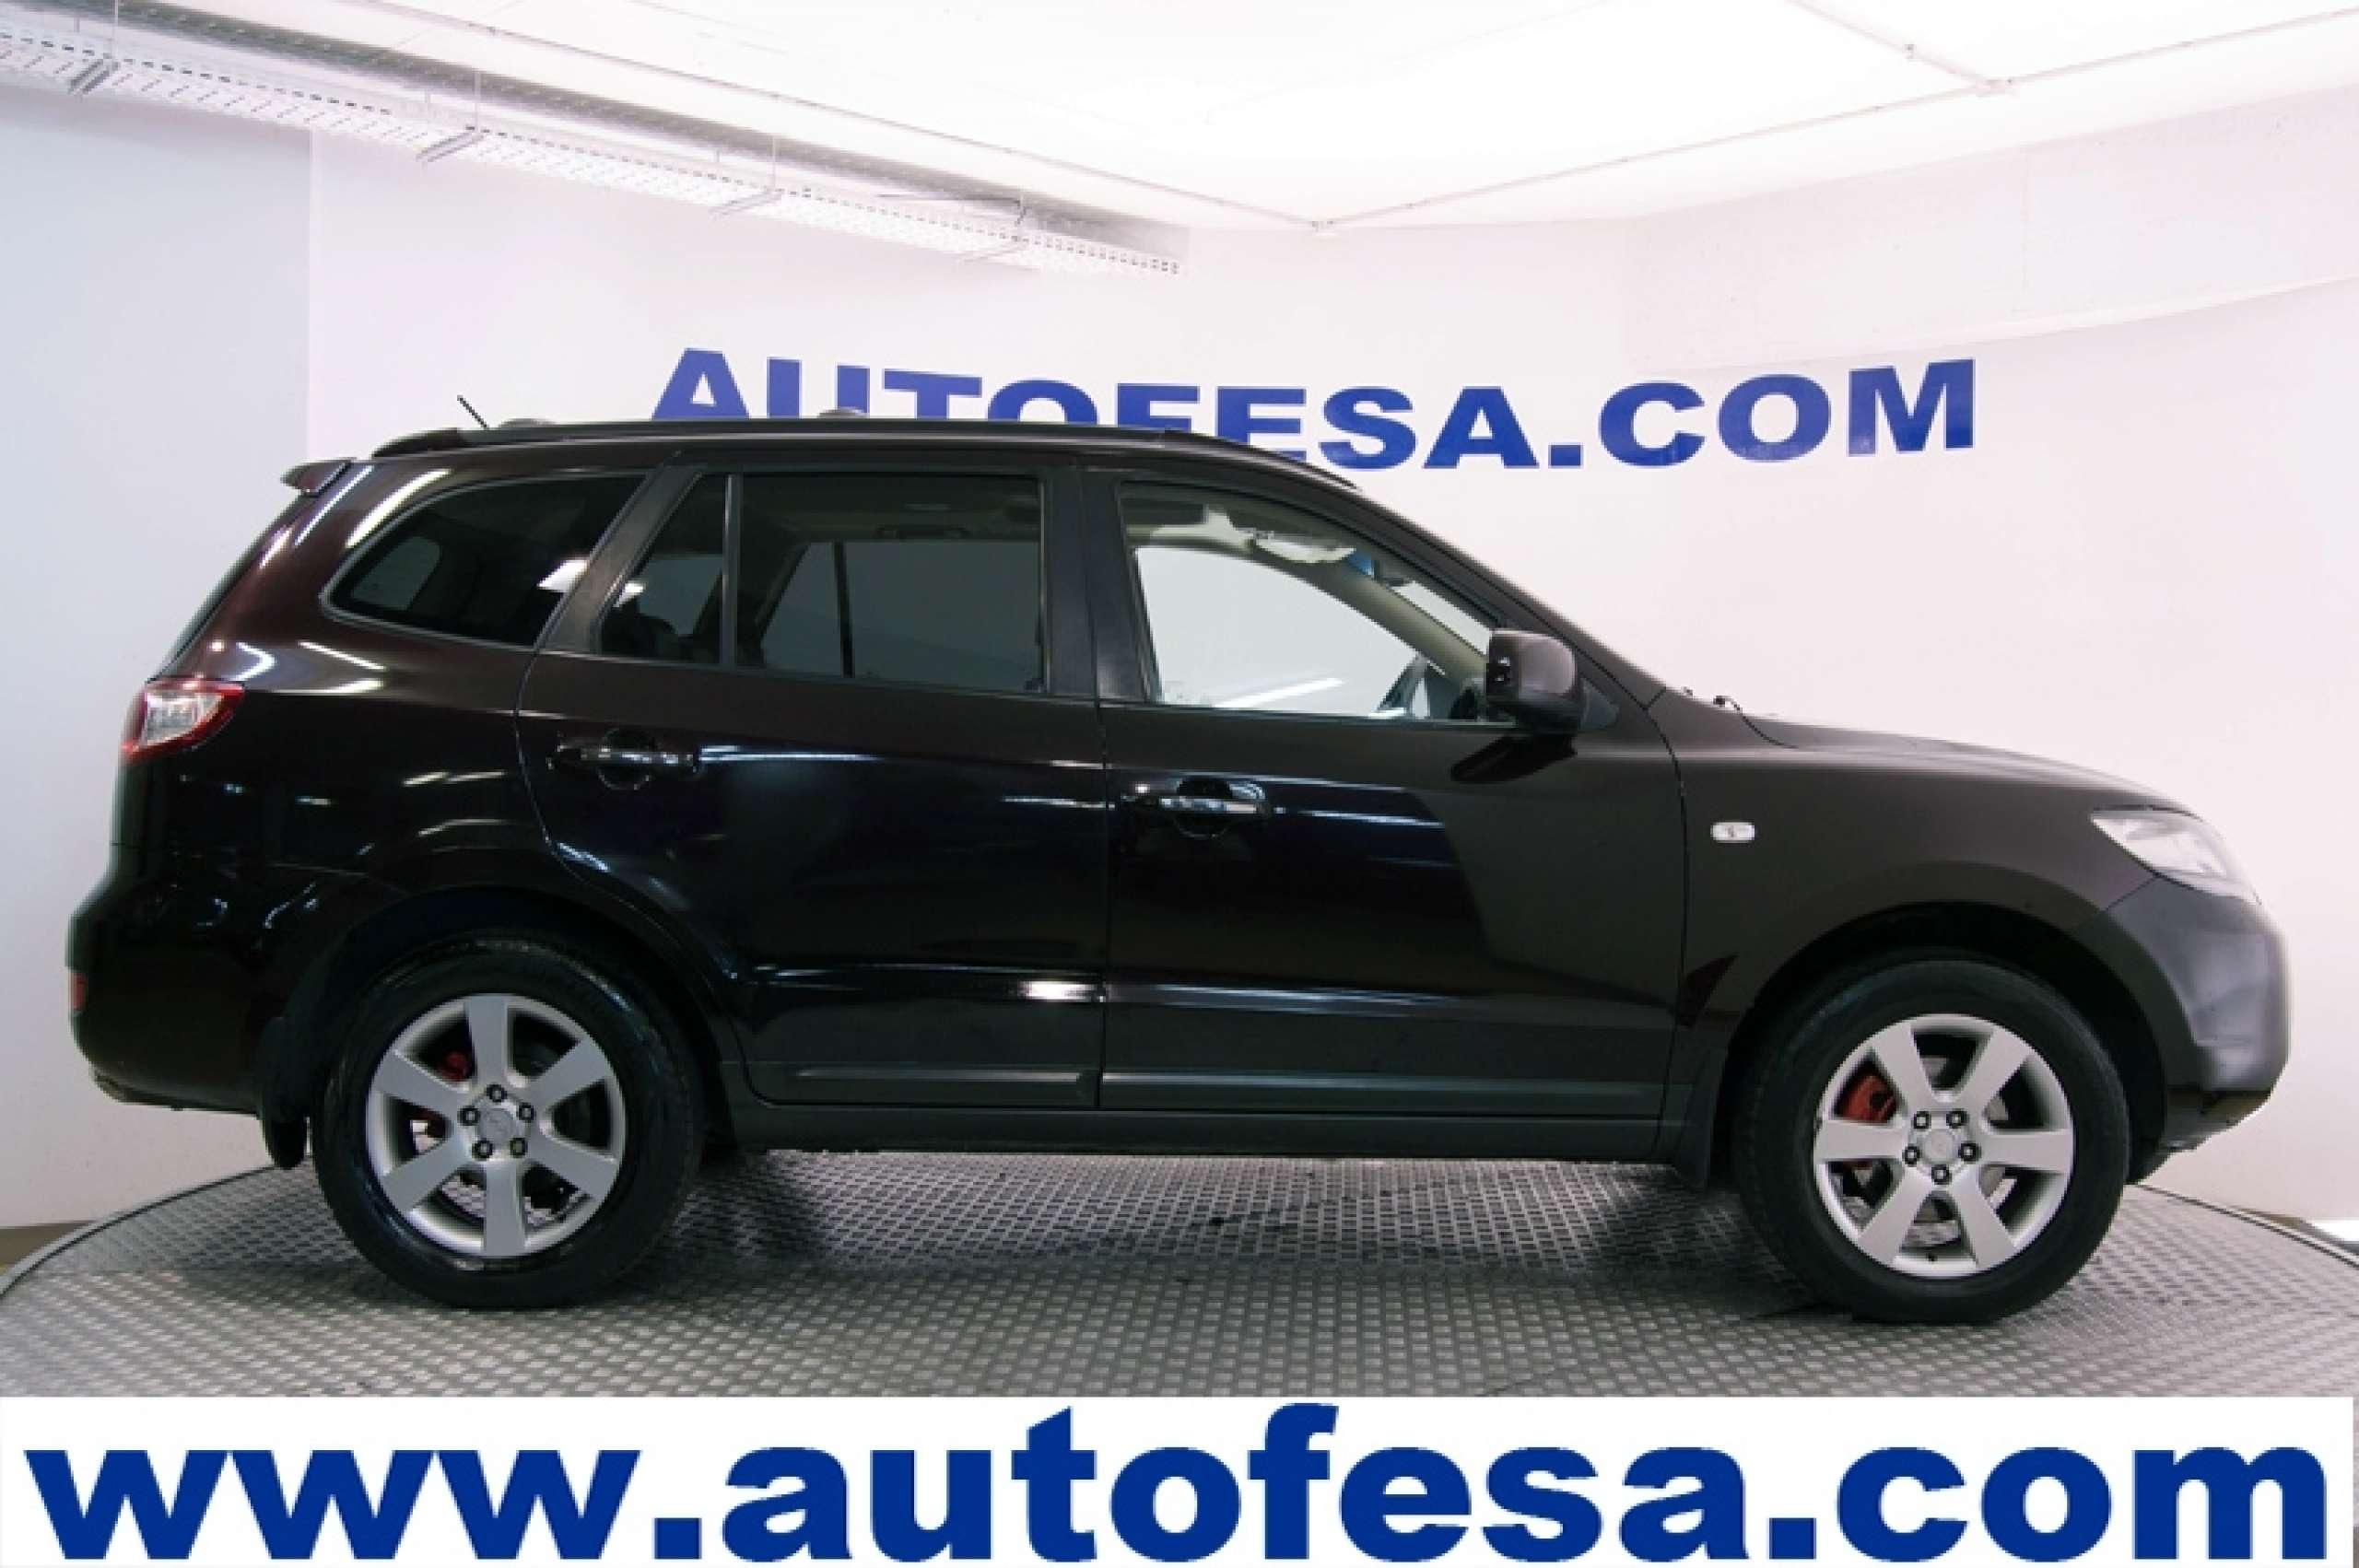 Hyundai Santa Fe 2.2 CRDI 155cv Style Auto 5p - Foto 10